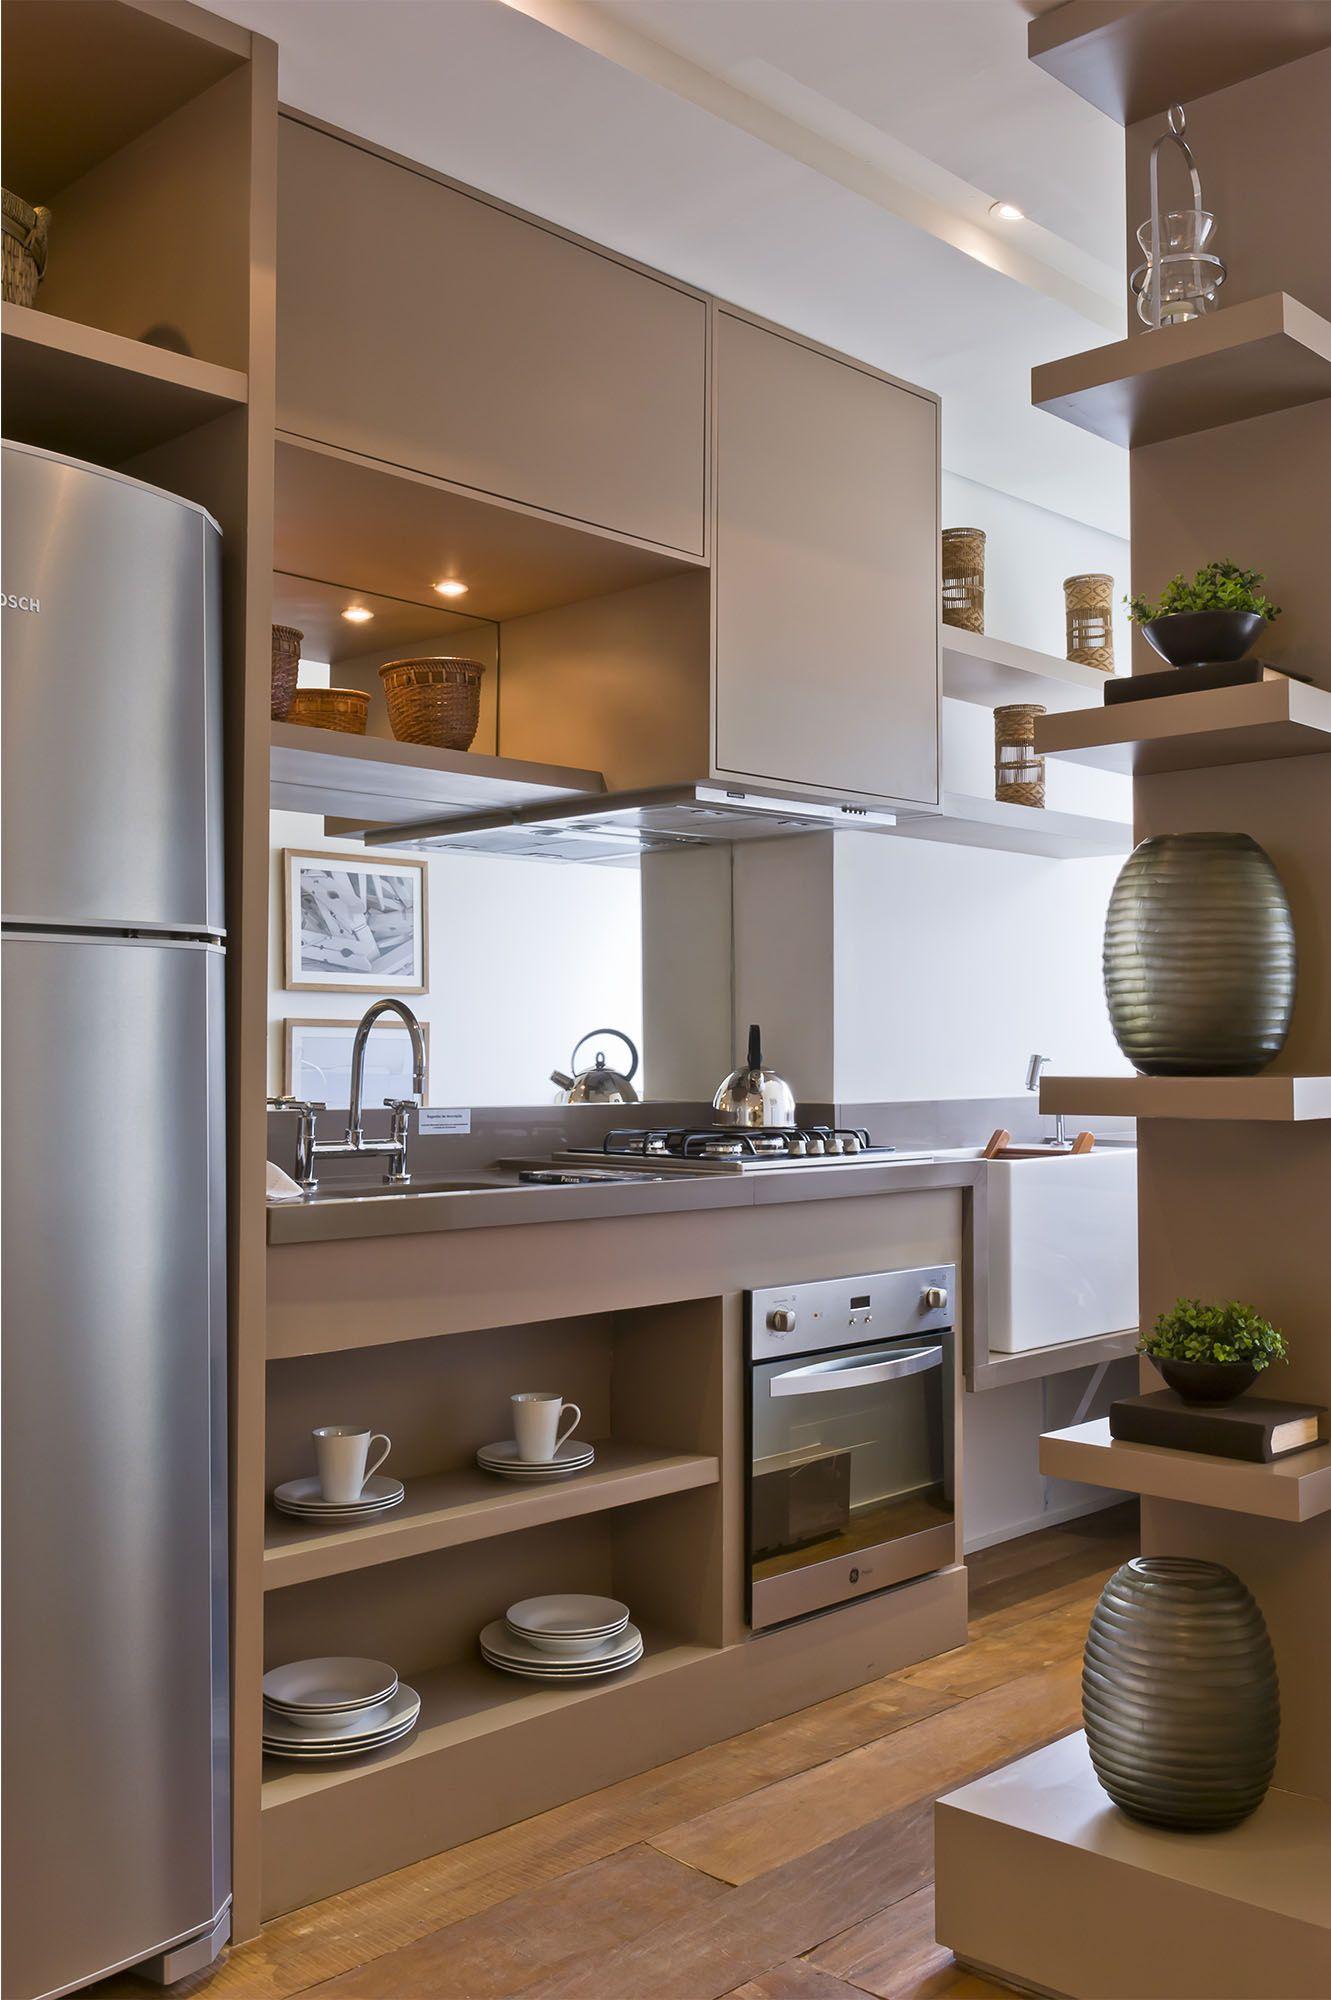 Modern Style Kitchen Cabinets Metod Kapk Med Brokhult Ljusgrayen Valnaptsmapnstrade Layendfronter Kapk